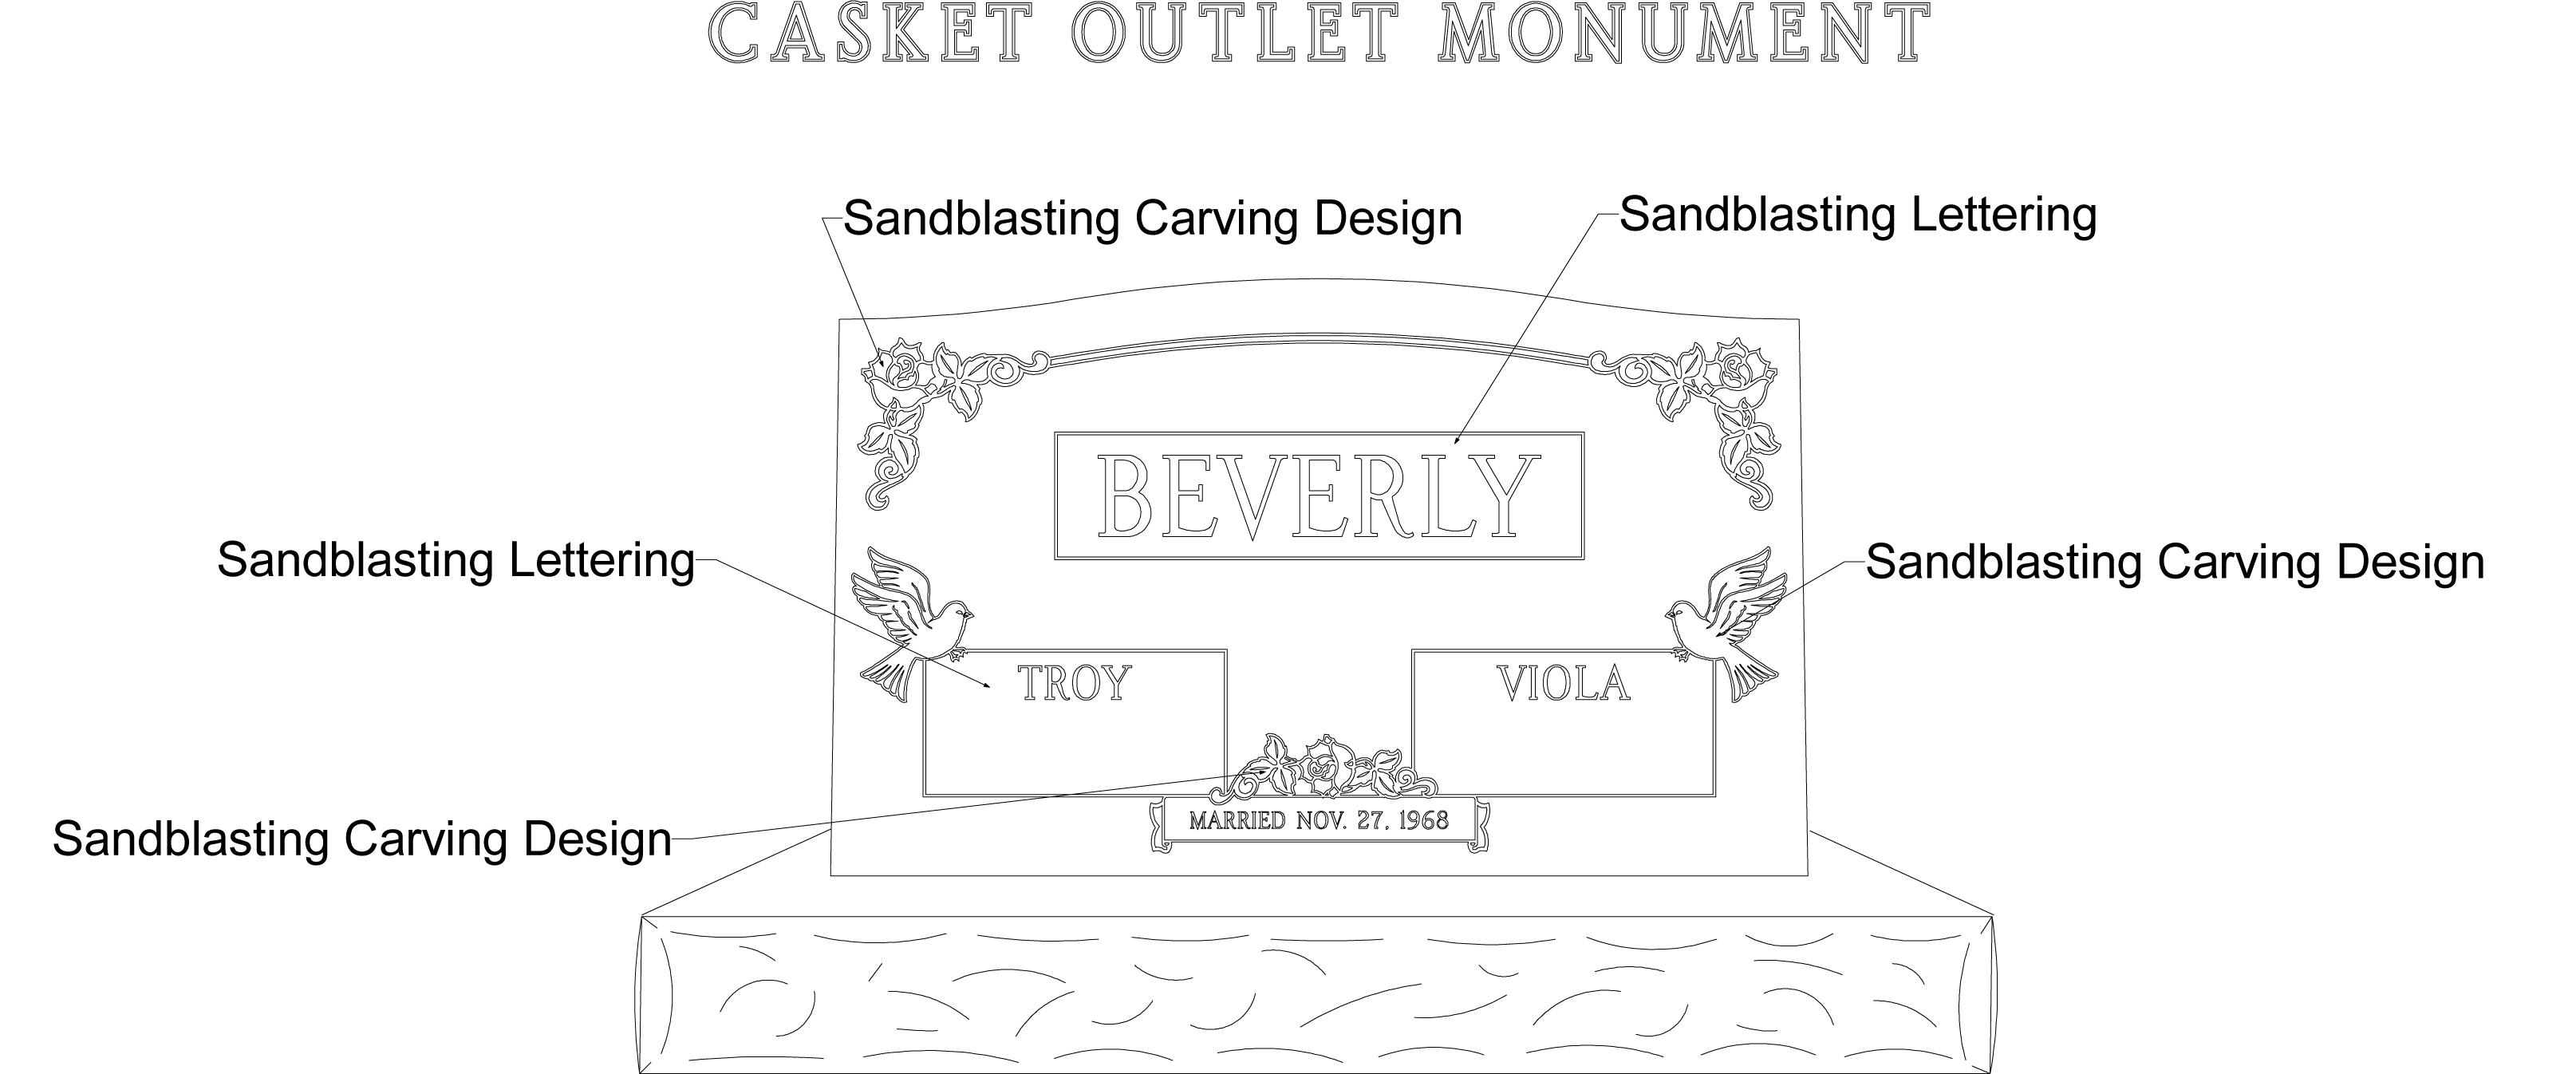 monument, headstone, upright monument, upright headstone design